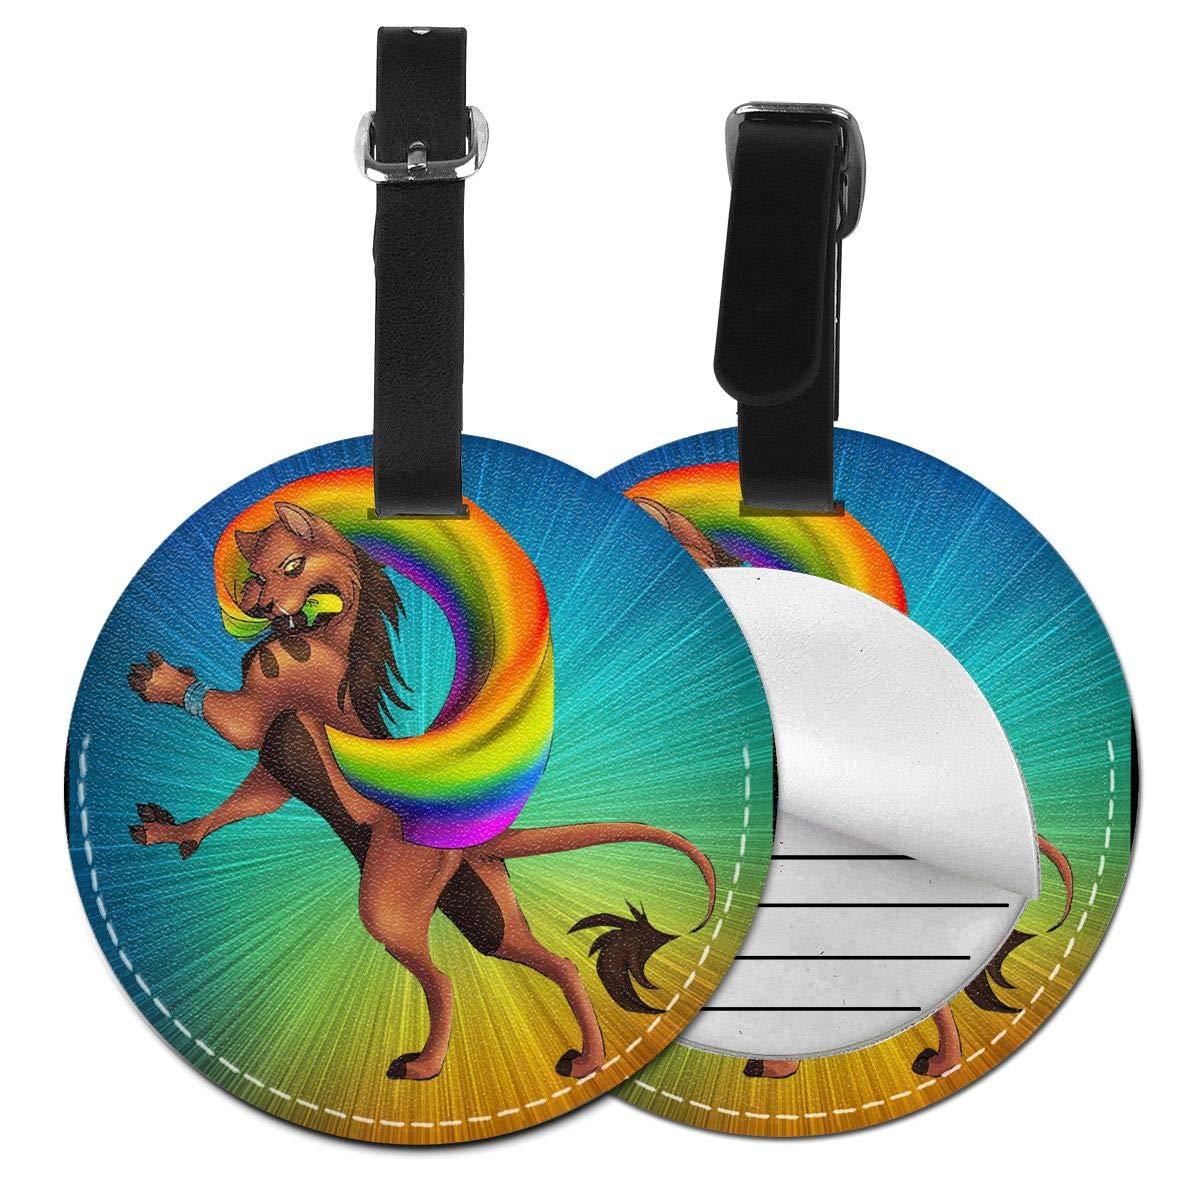 Free-2 Pride Parade LGBT Pride Luggage Tag 3D Print Leather Travel Bag ID Card